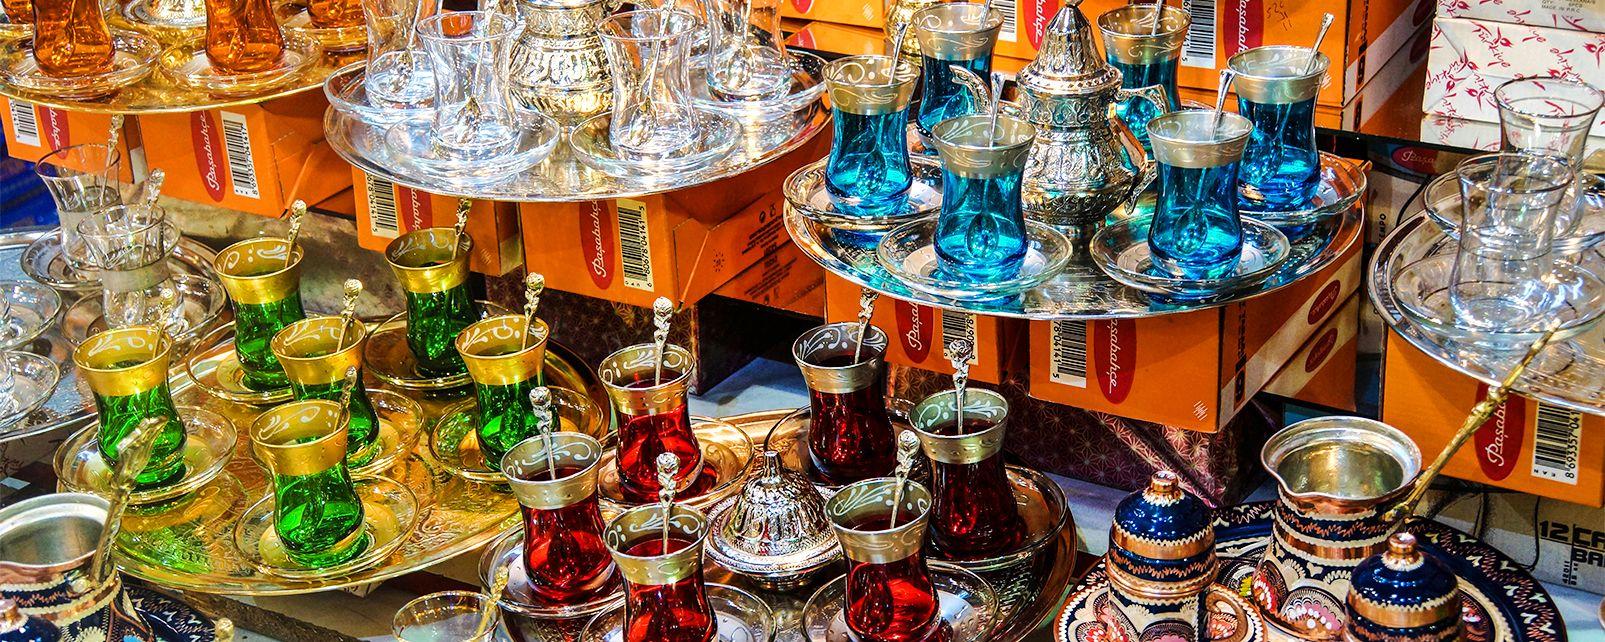 , Le souk Khân al-Khalili, Les sites, Egypte